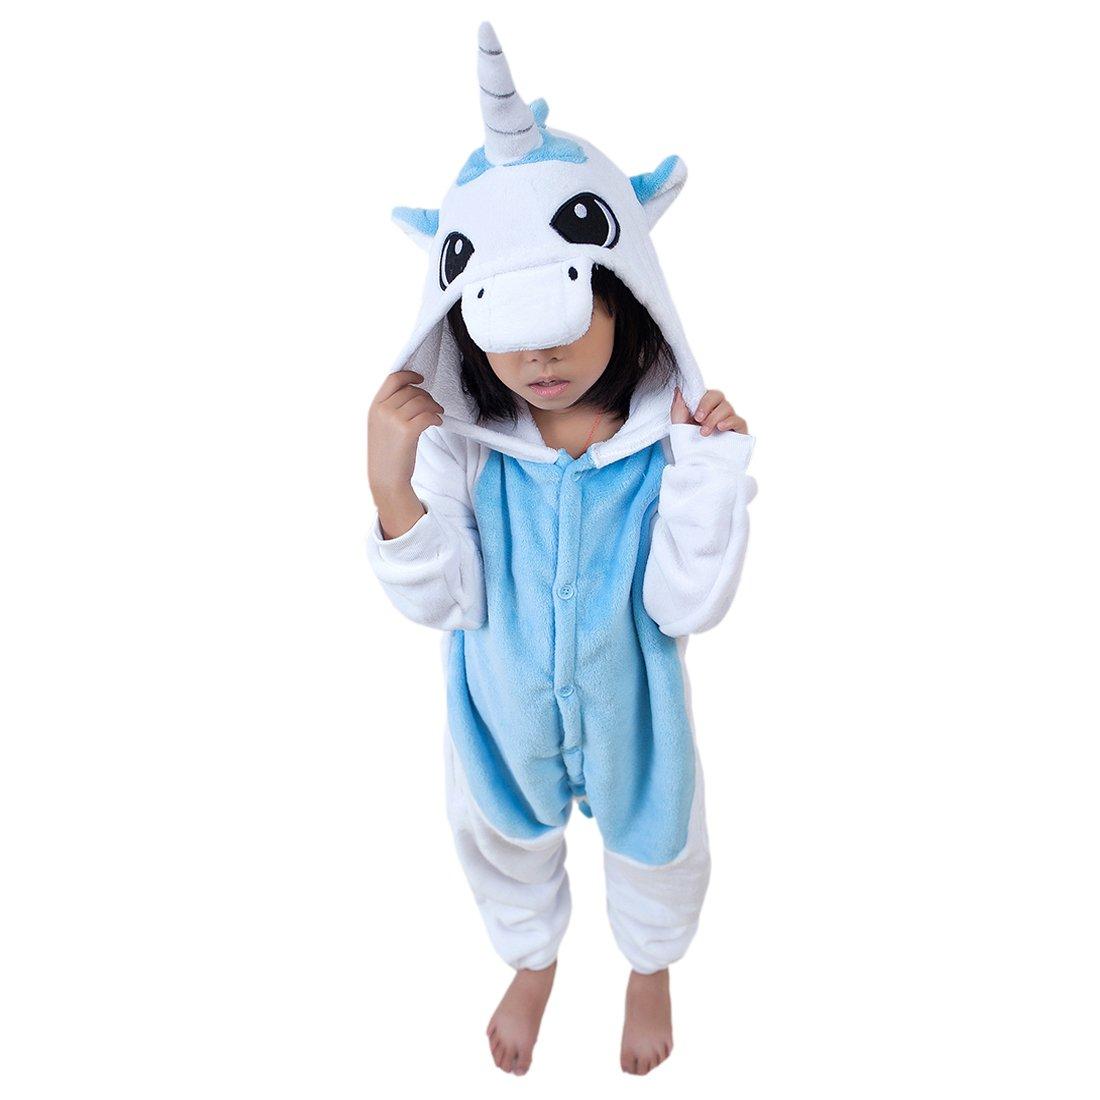 DarkCom Bambini Kigurumi Onesie Pigiama Animale Costumi Cosplay Del Fumetto Tuta Pigiameria Unicorno